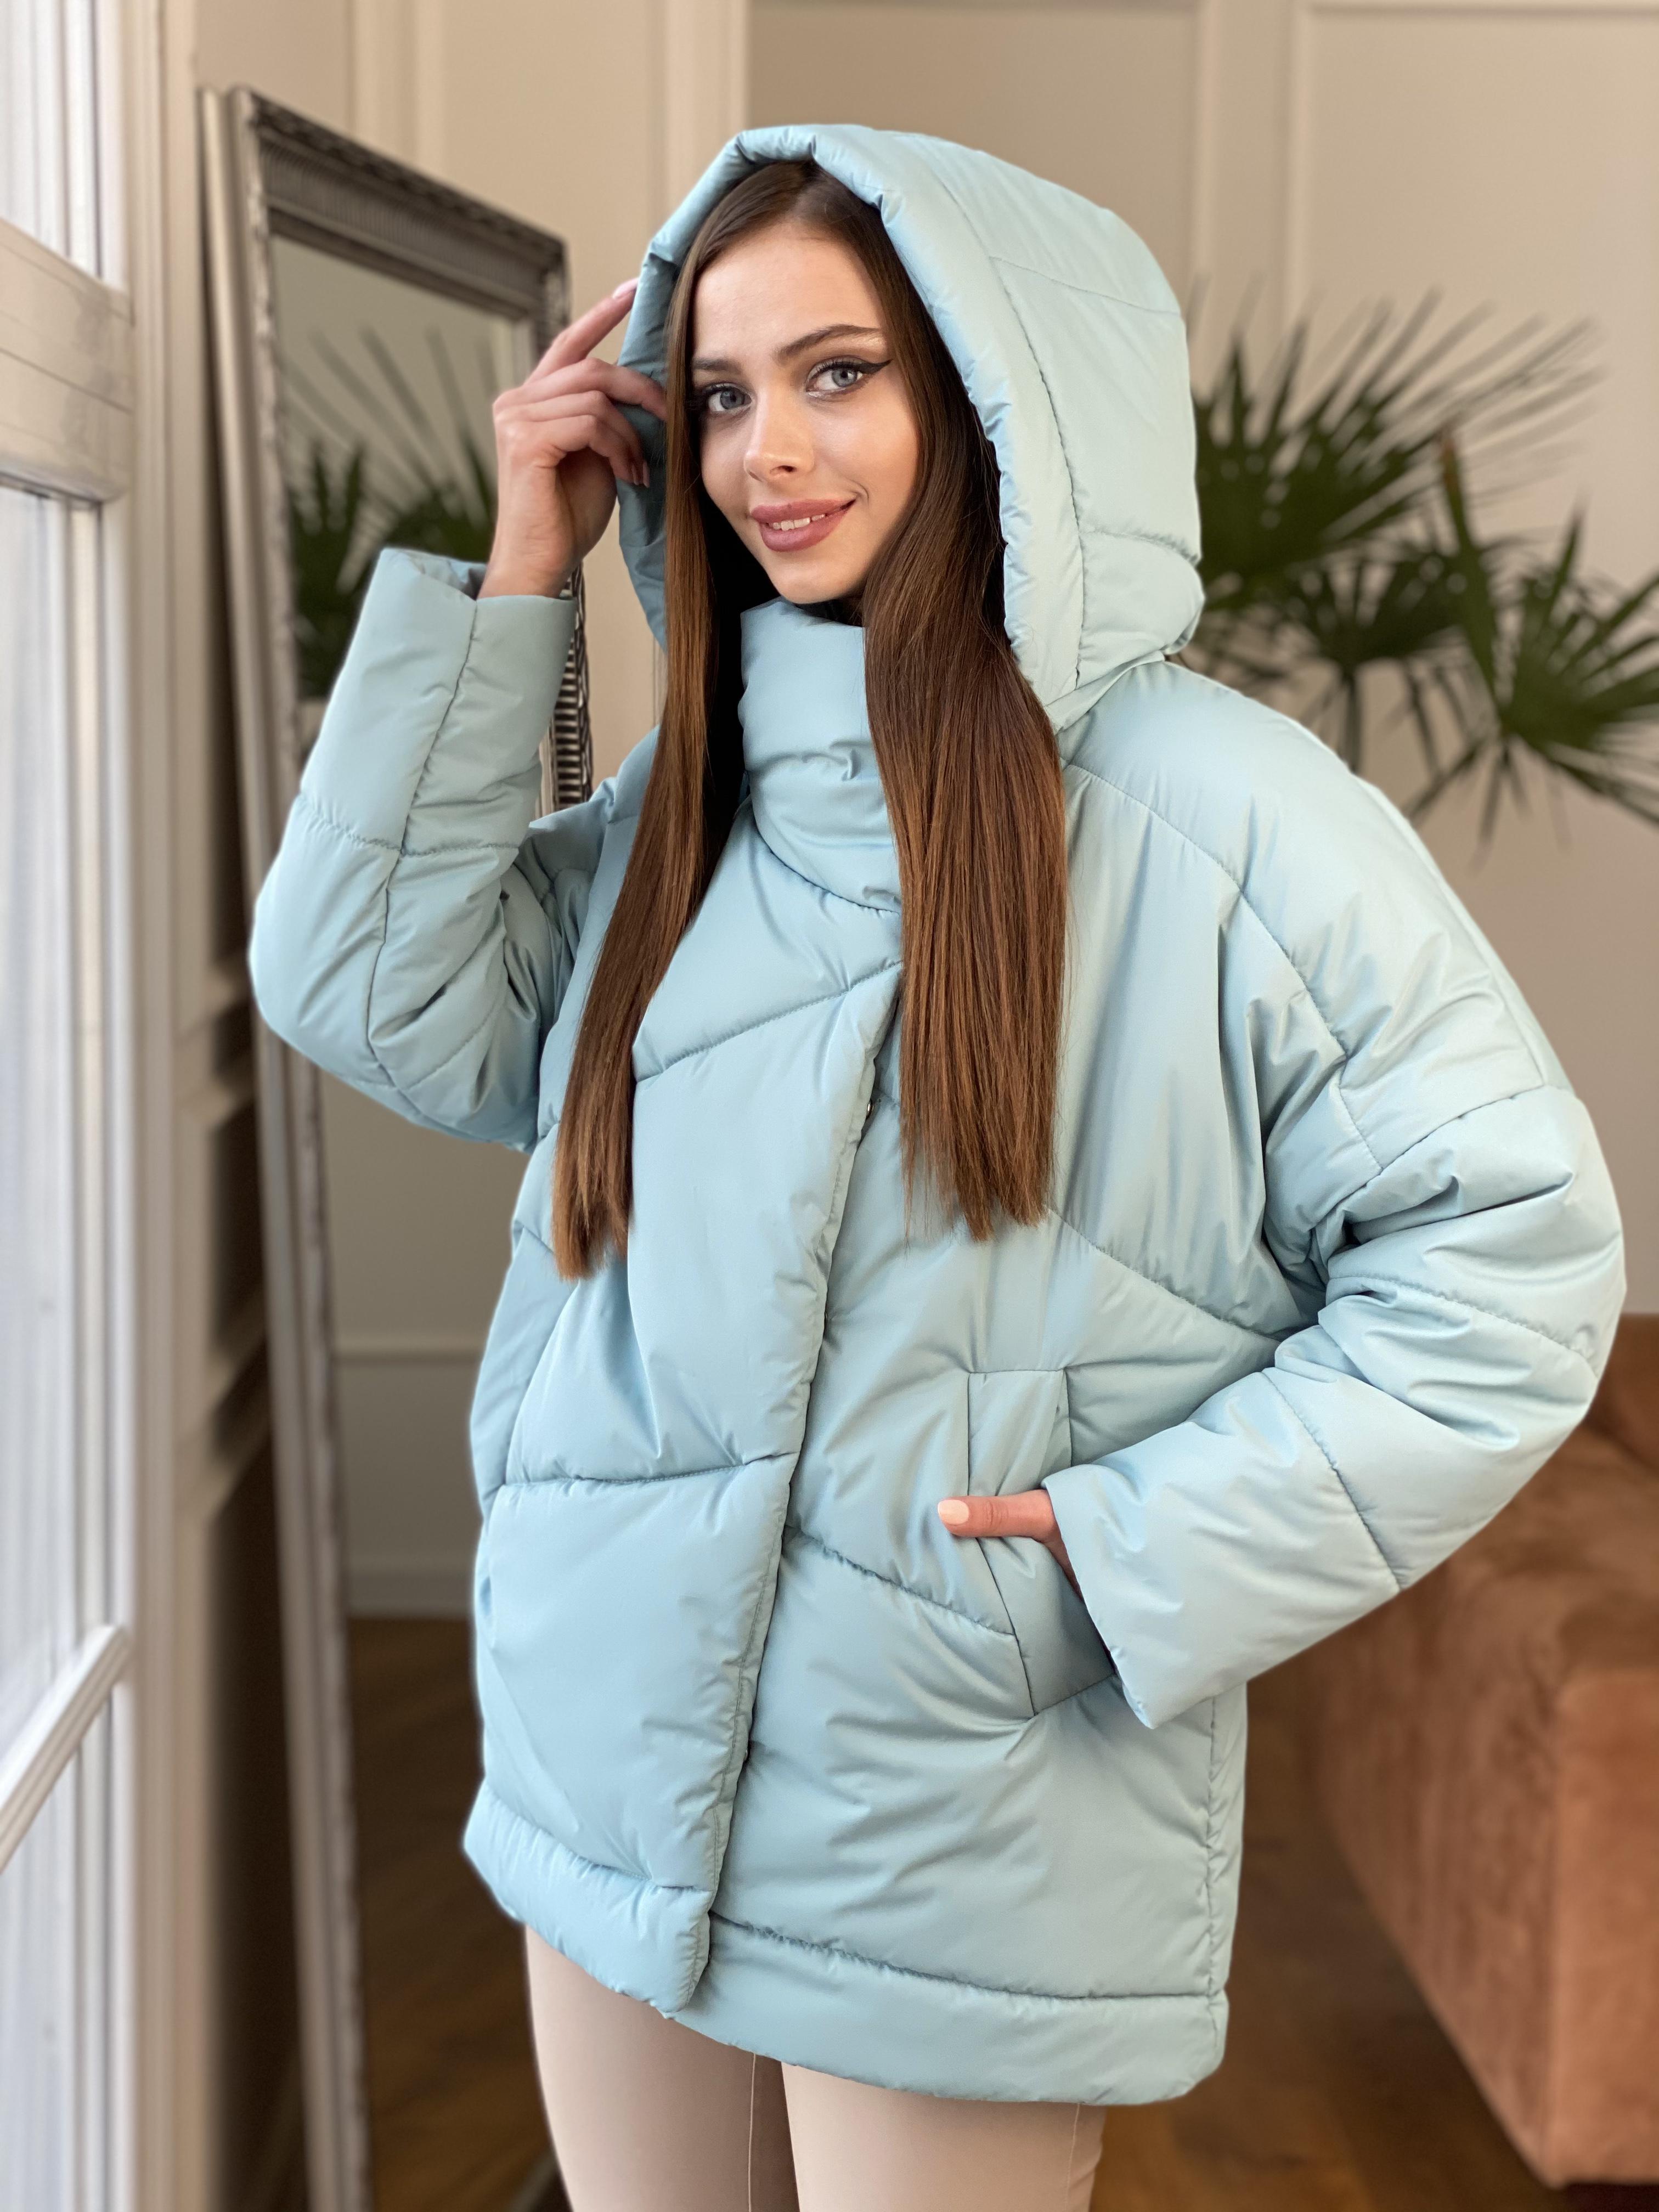 Уно куртка плащевка Ammy 10671 АРТ. 47079 Цвет: Олива - фото 8, интернет магазин tm-modus.ru